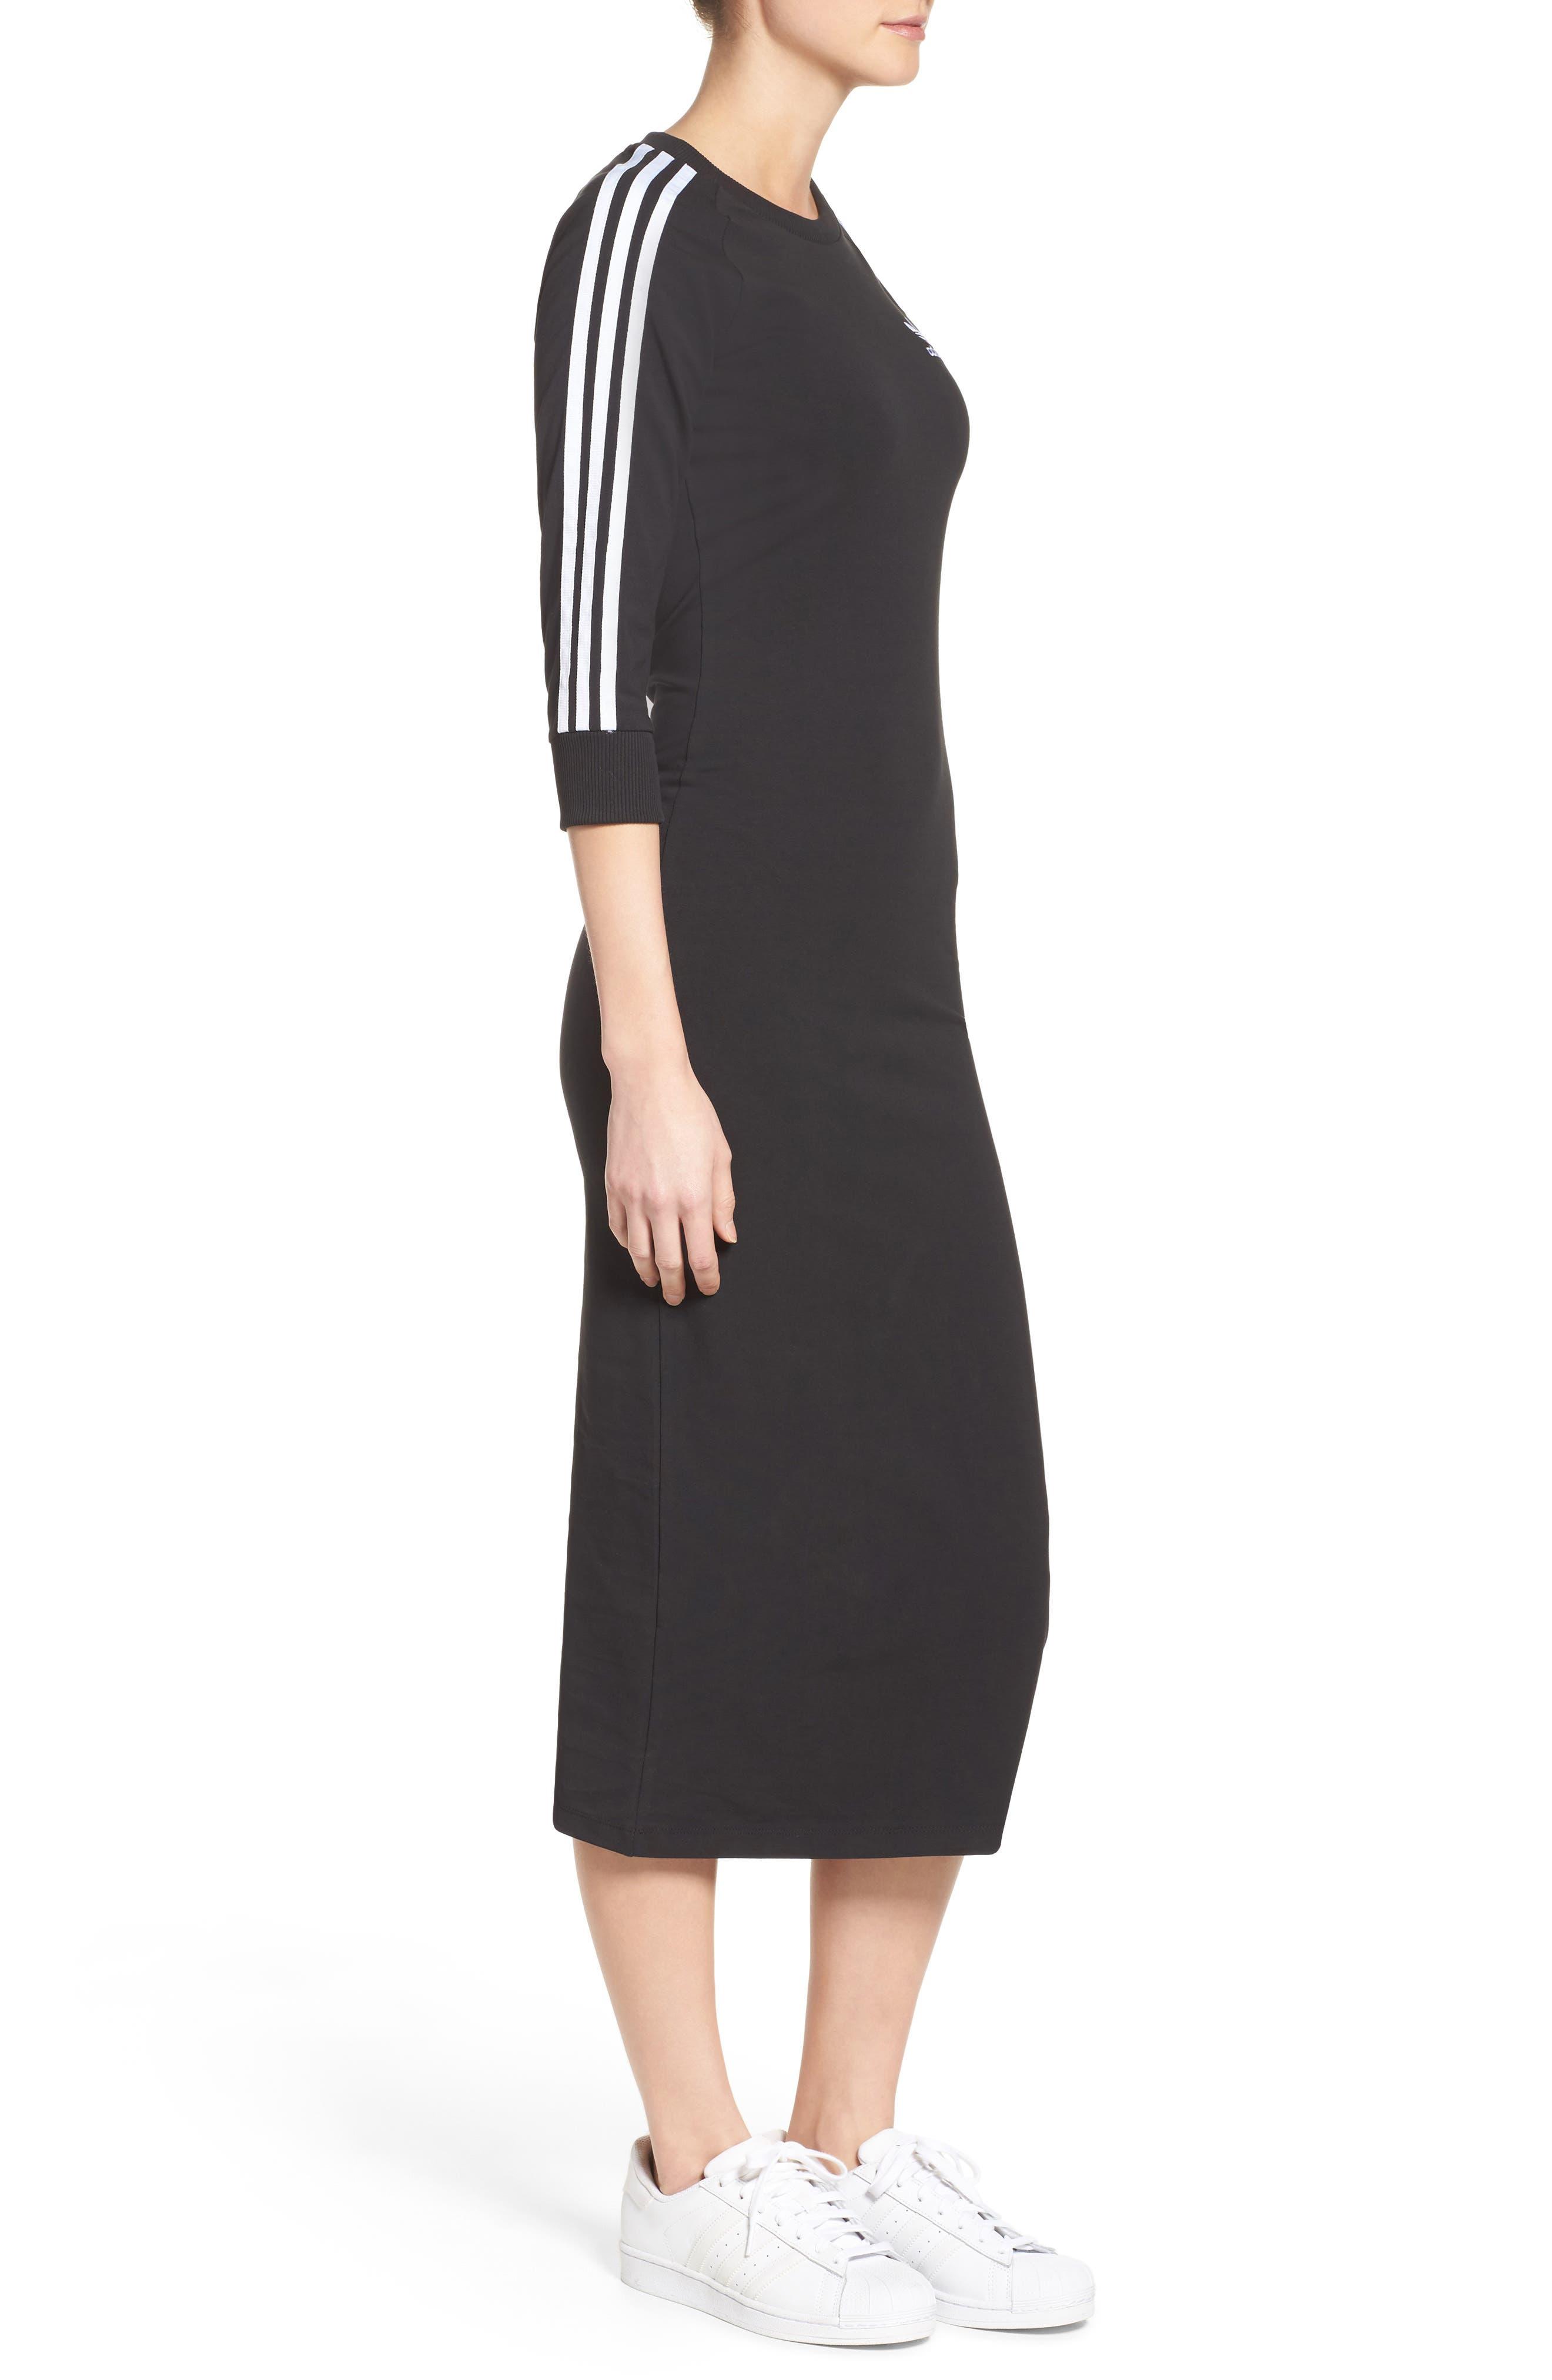 Originals 3-Stripes Dress,                             Alternate thumbnail 3, color,                             Black